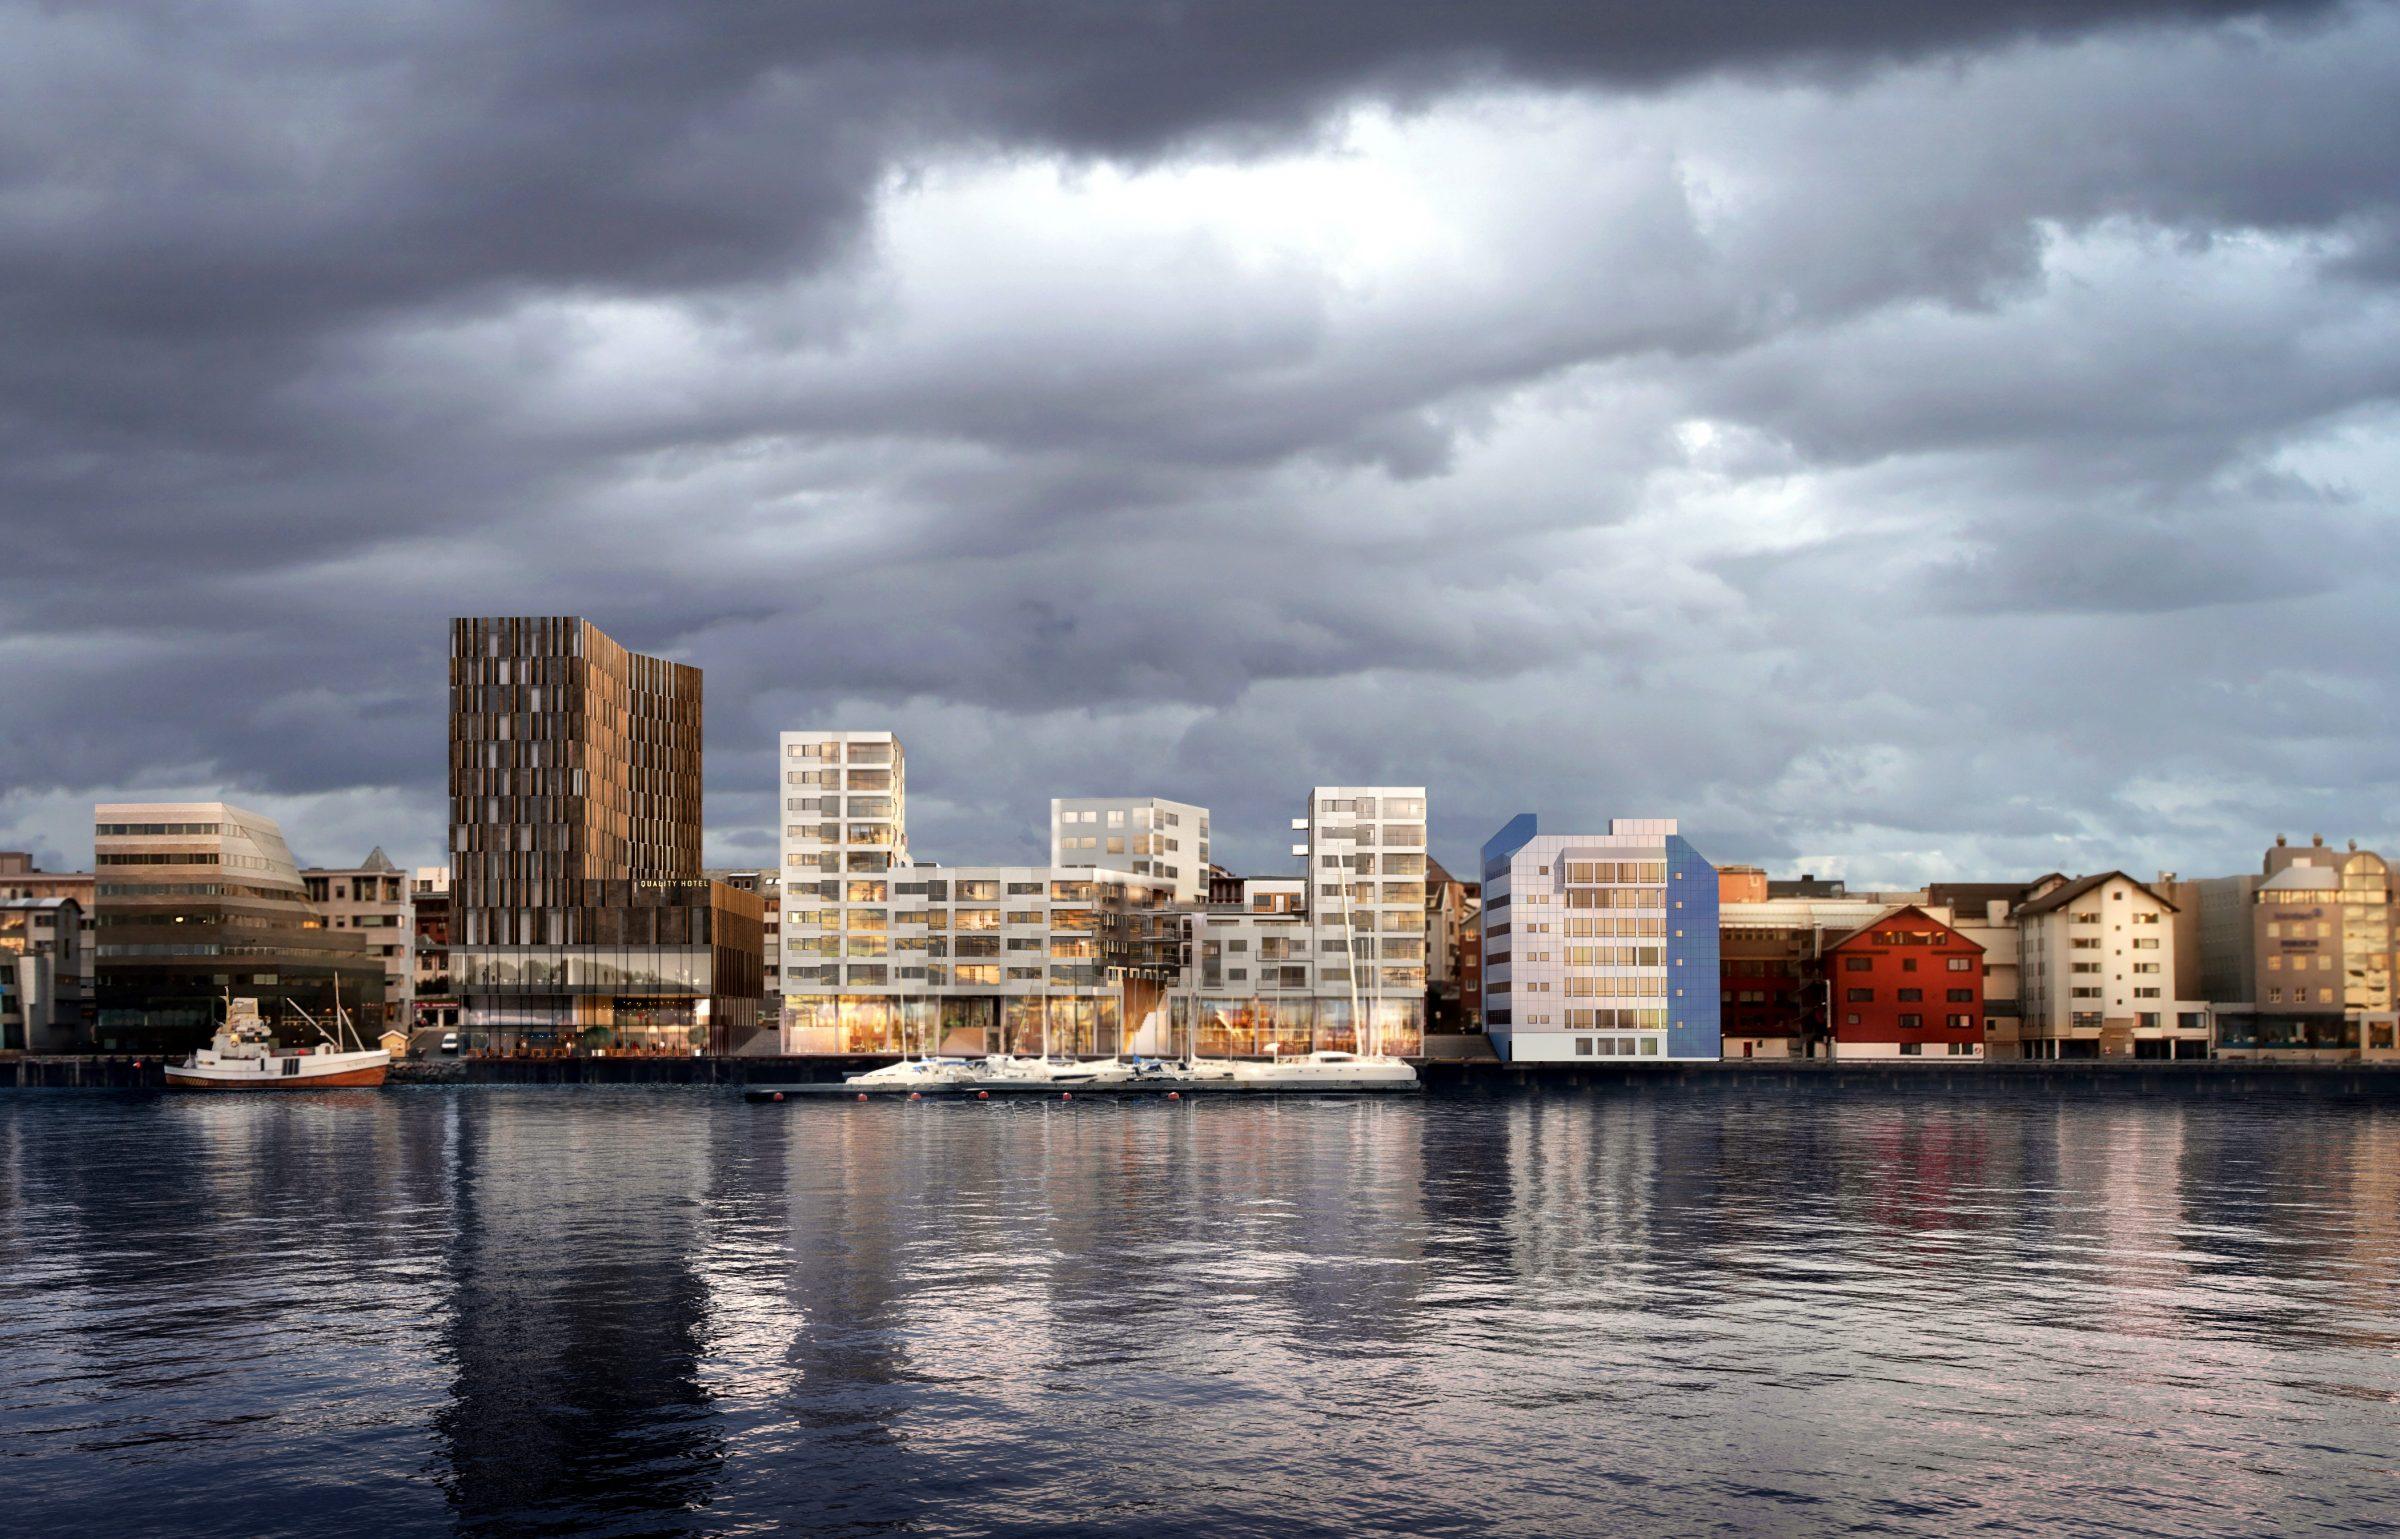 Bølgen & Moi Bodø